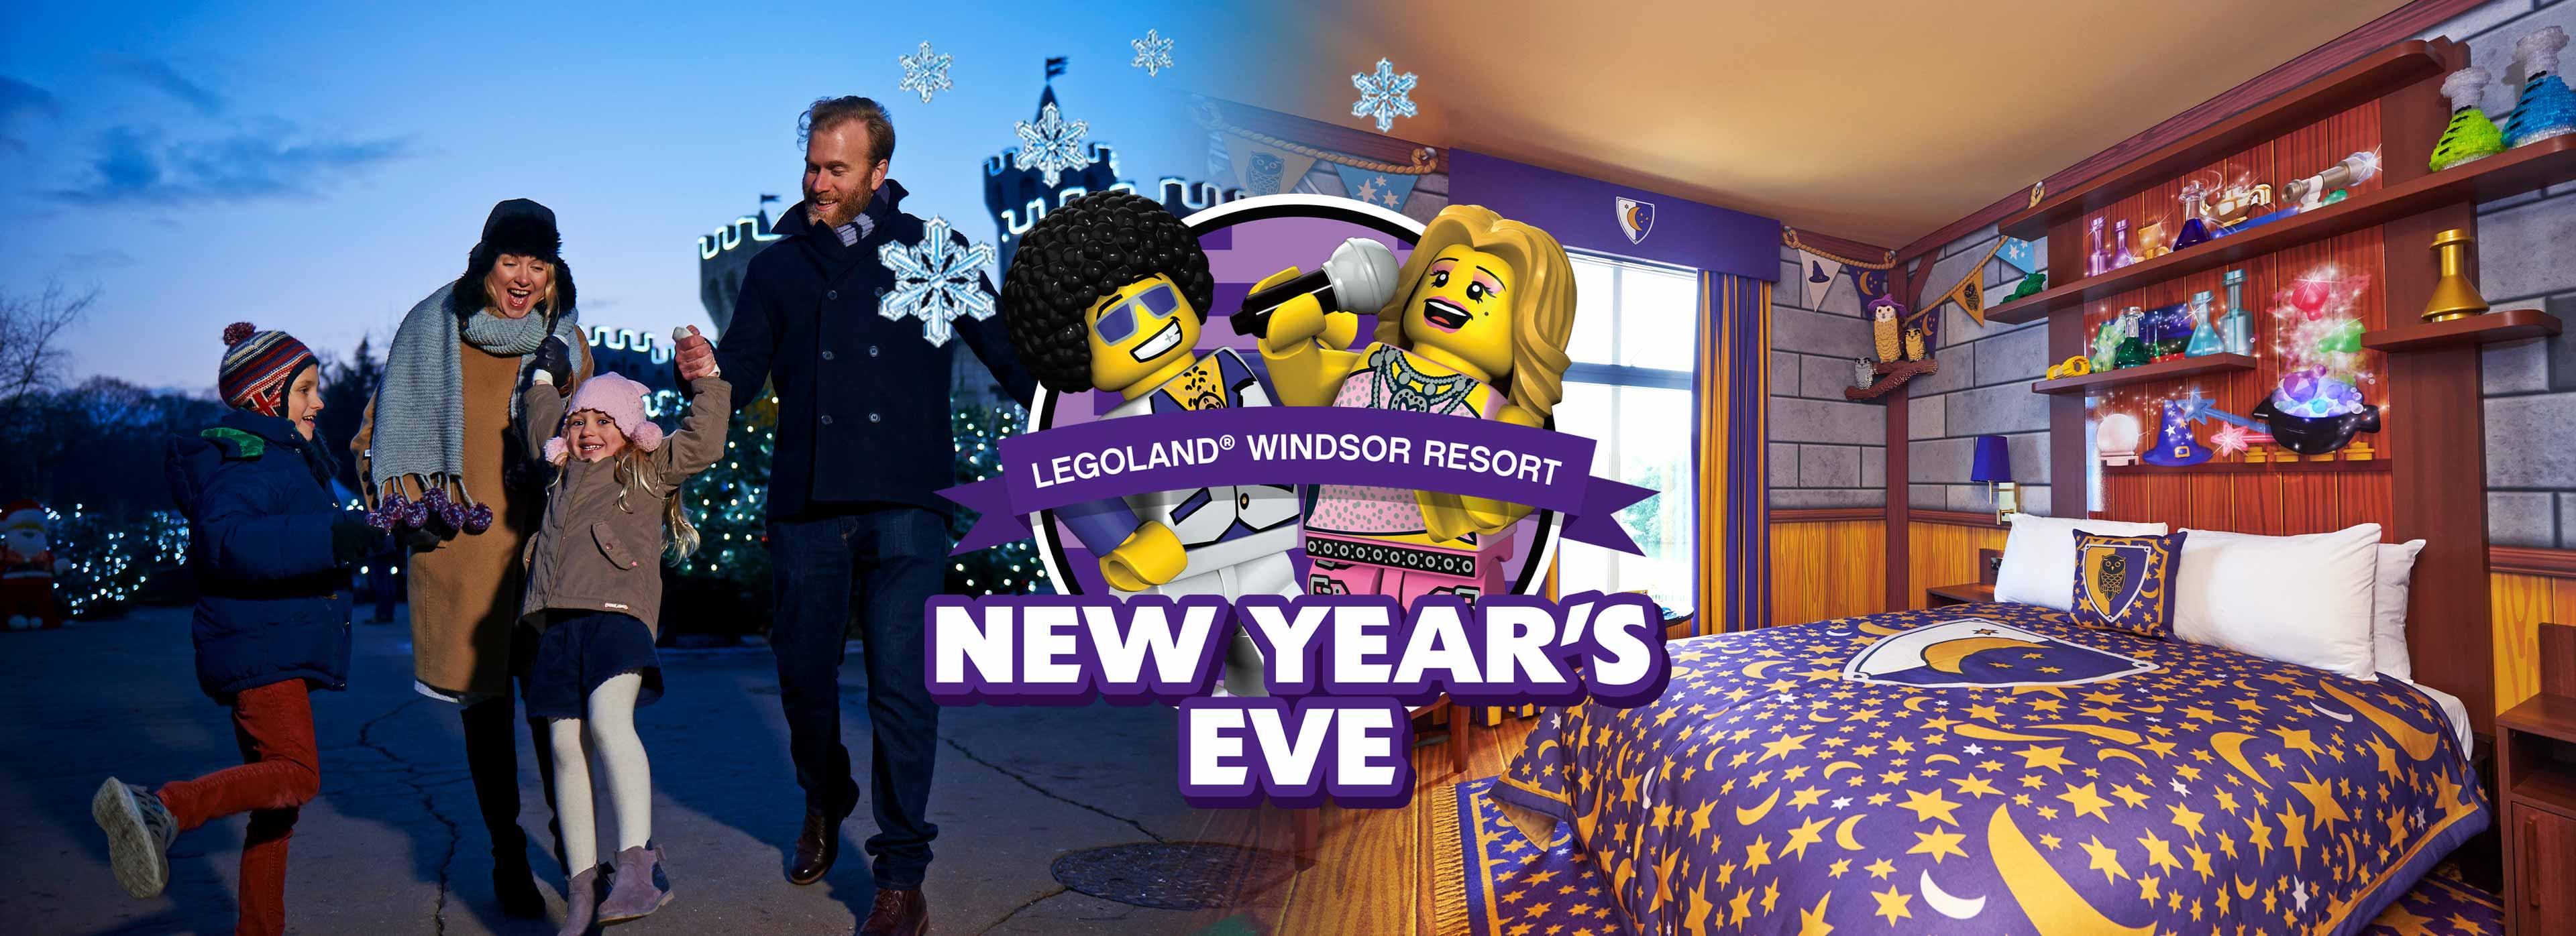 Book your family's LEGOLAND Windsor Resort New Year's Eve short break today!